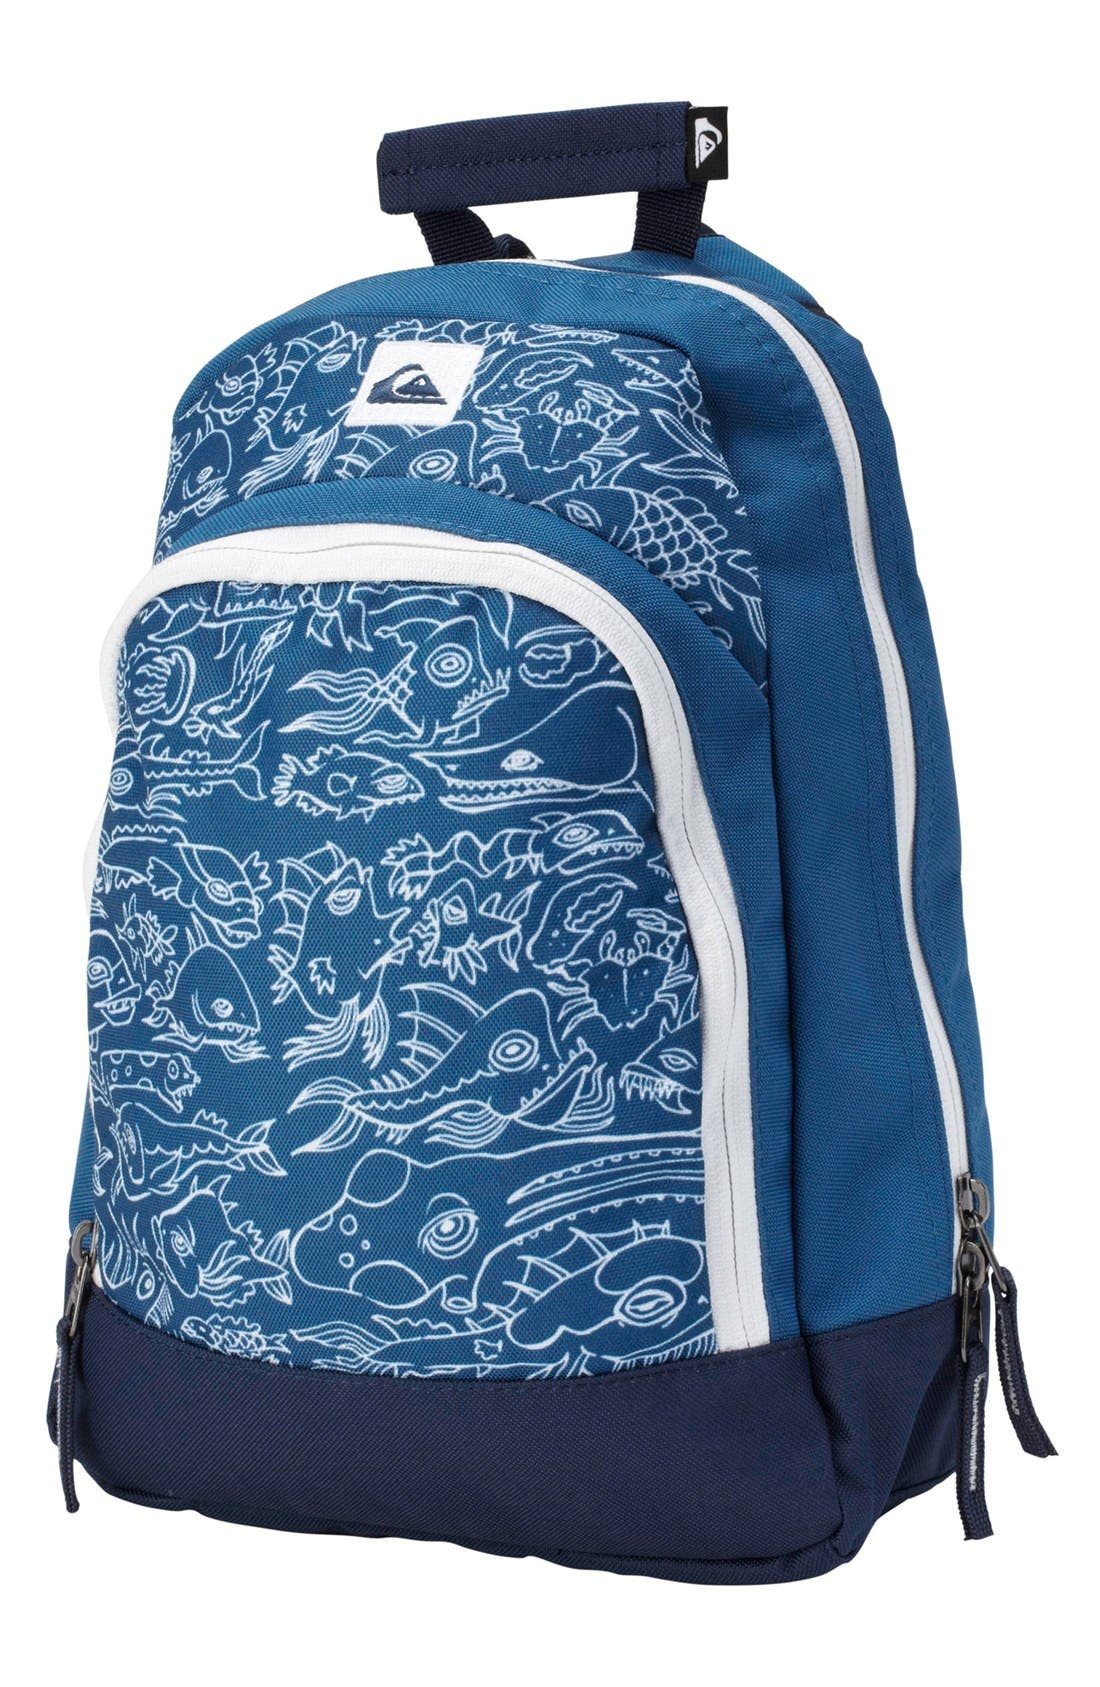 Alternate Image 1 Selected - Quiksilver 'Chomper' Backpack